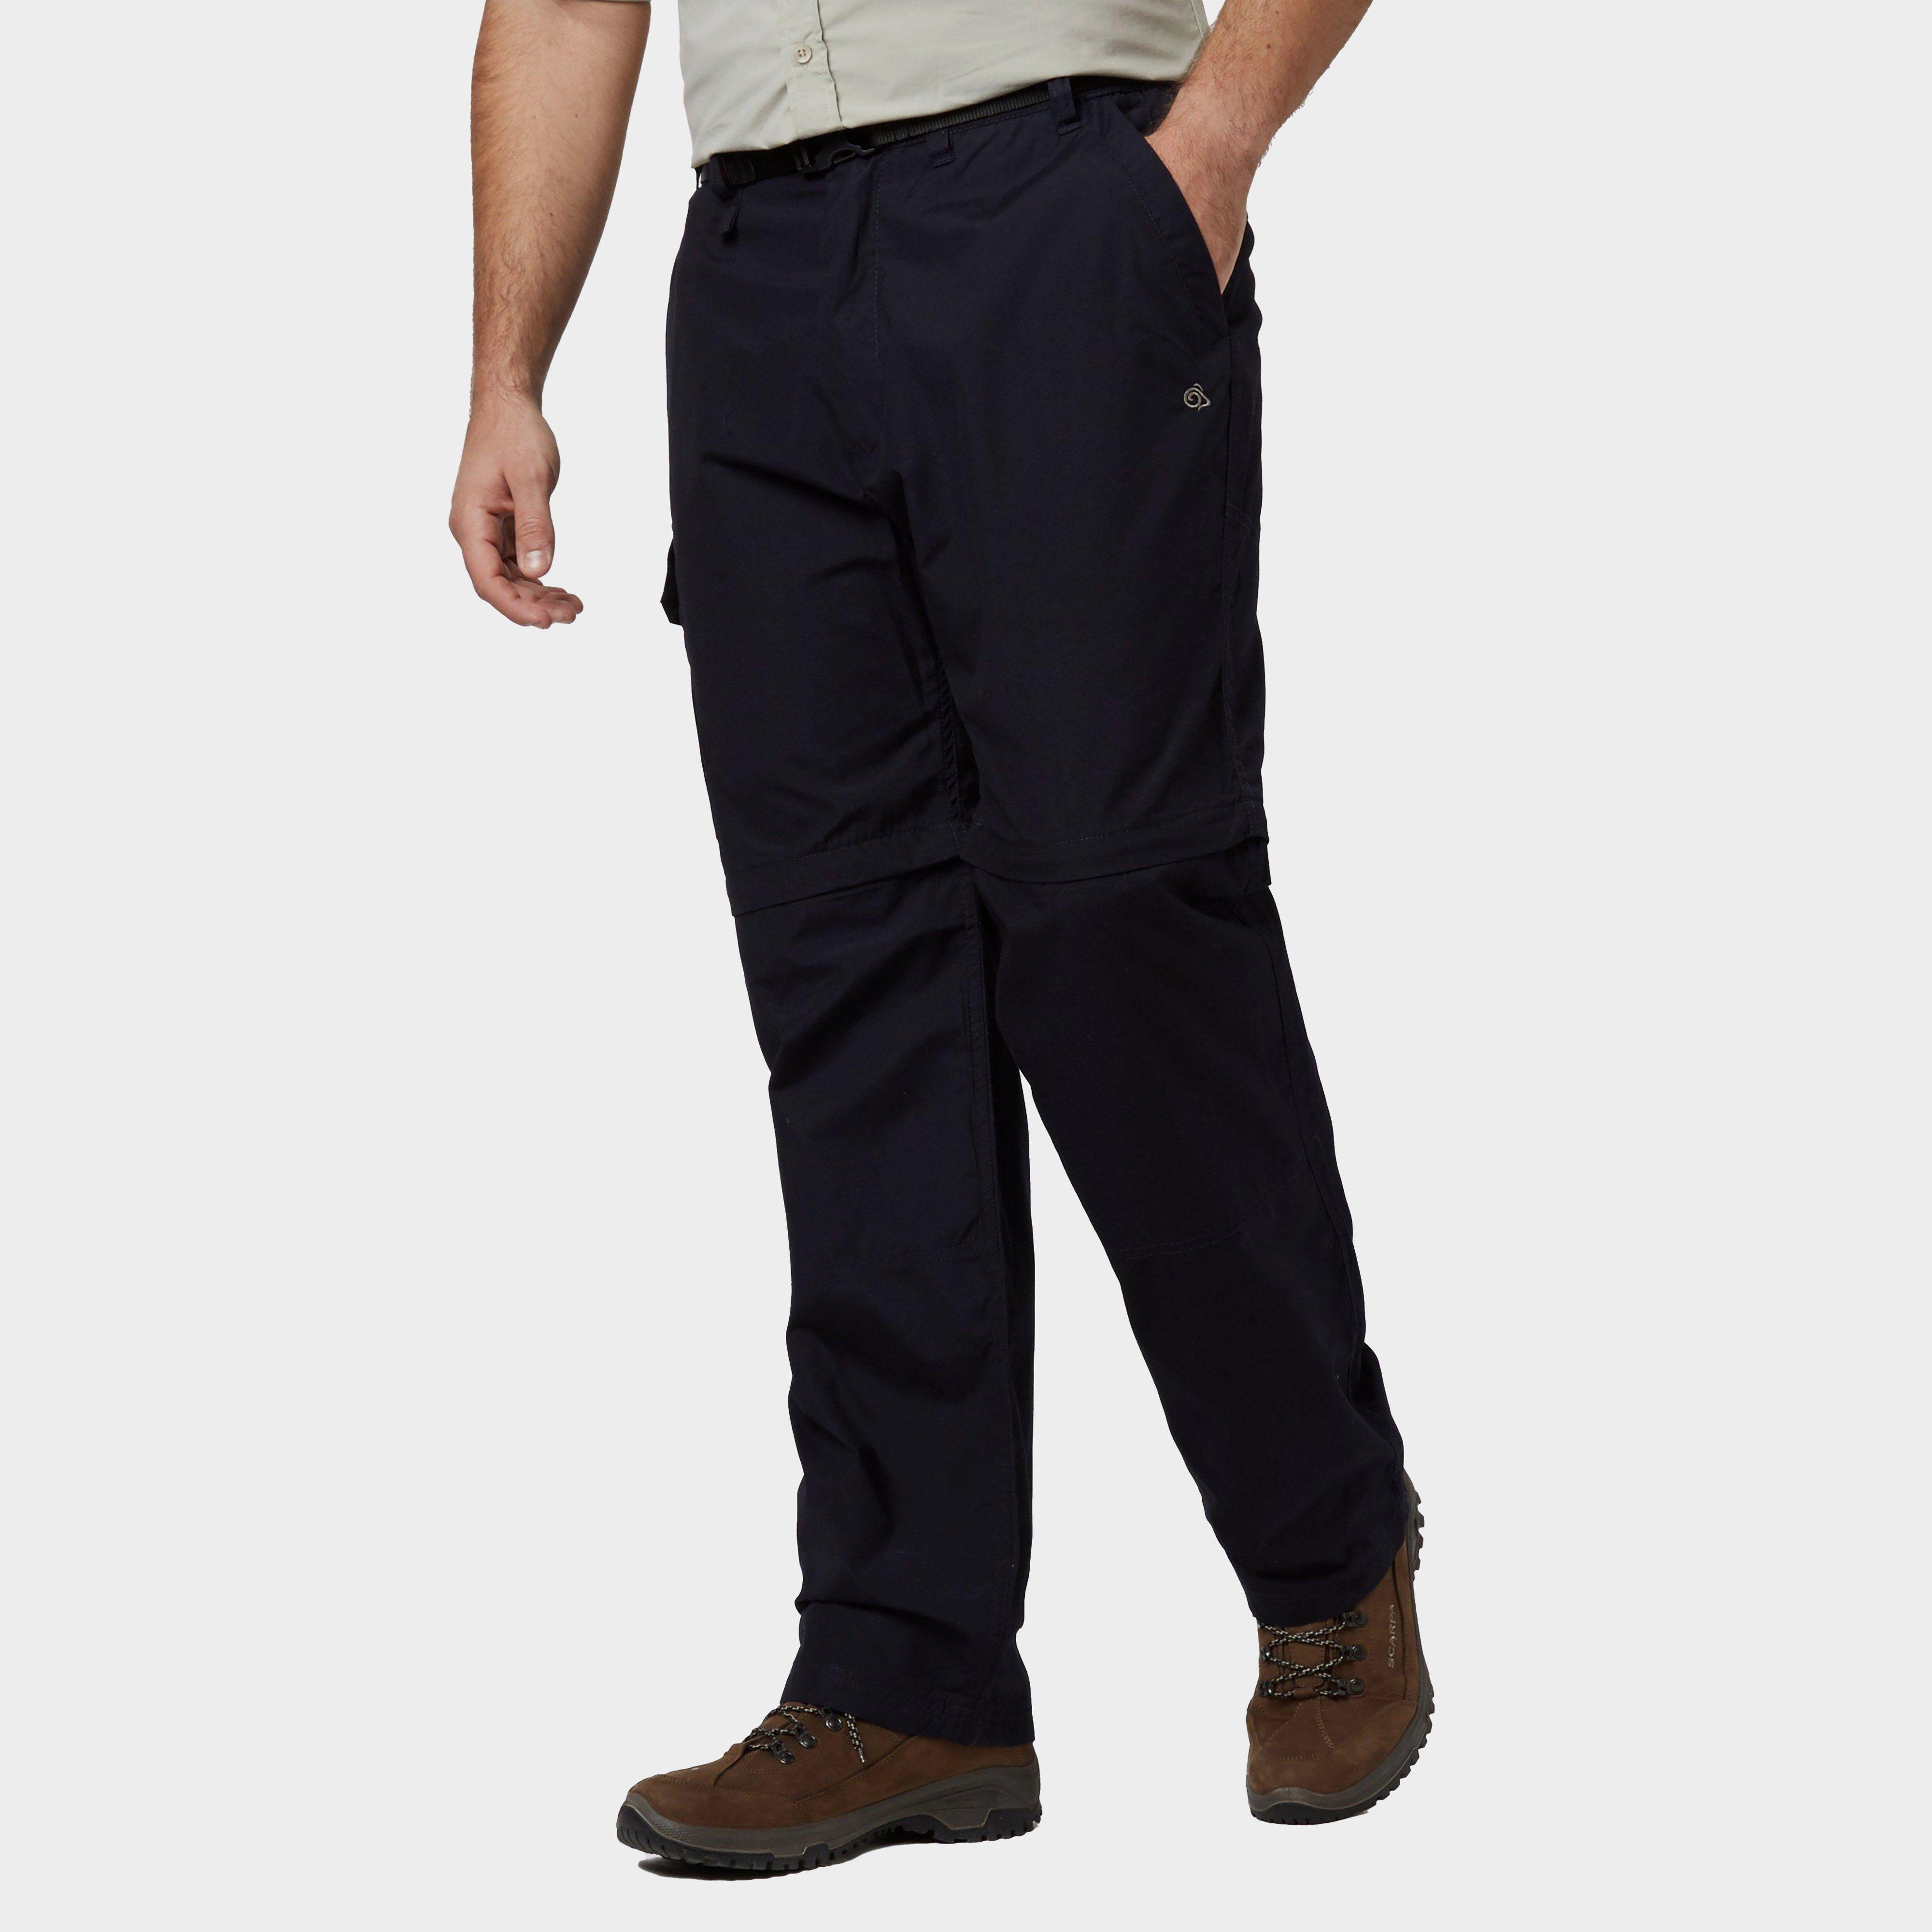 CRAGHOPPERS Men's Kiwi Zip Off Trousers